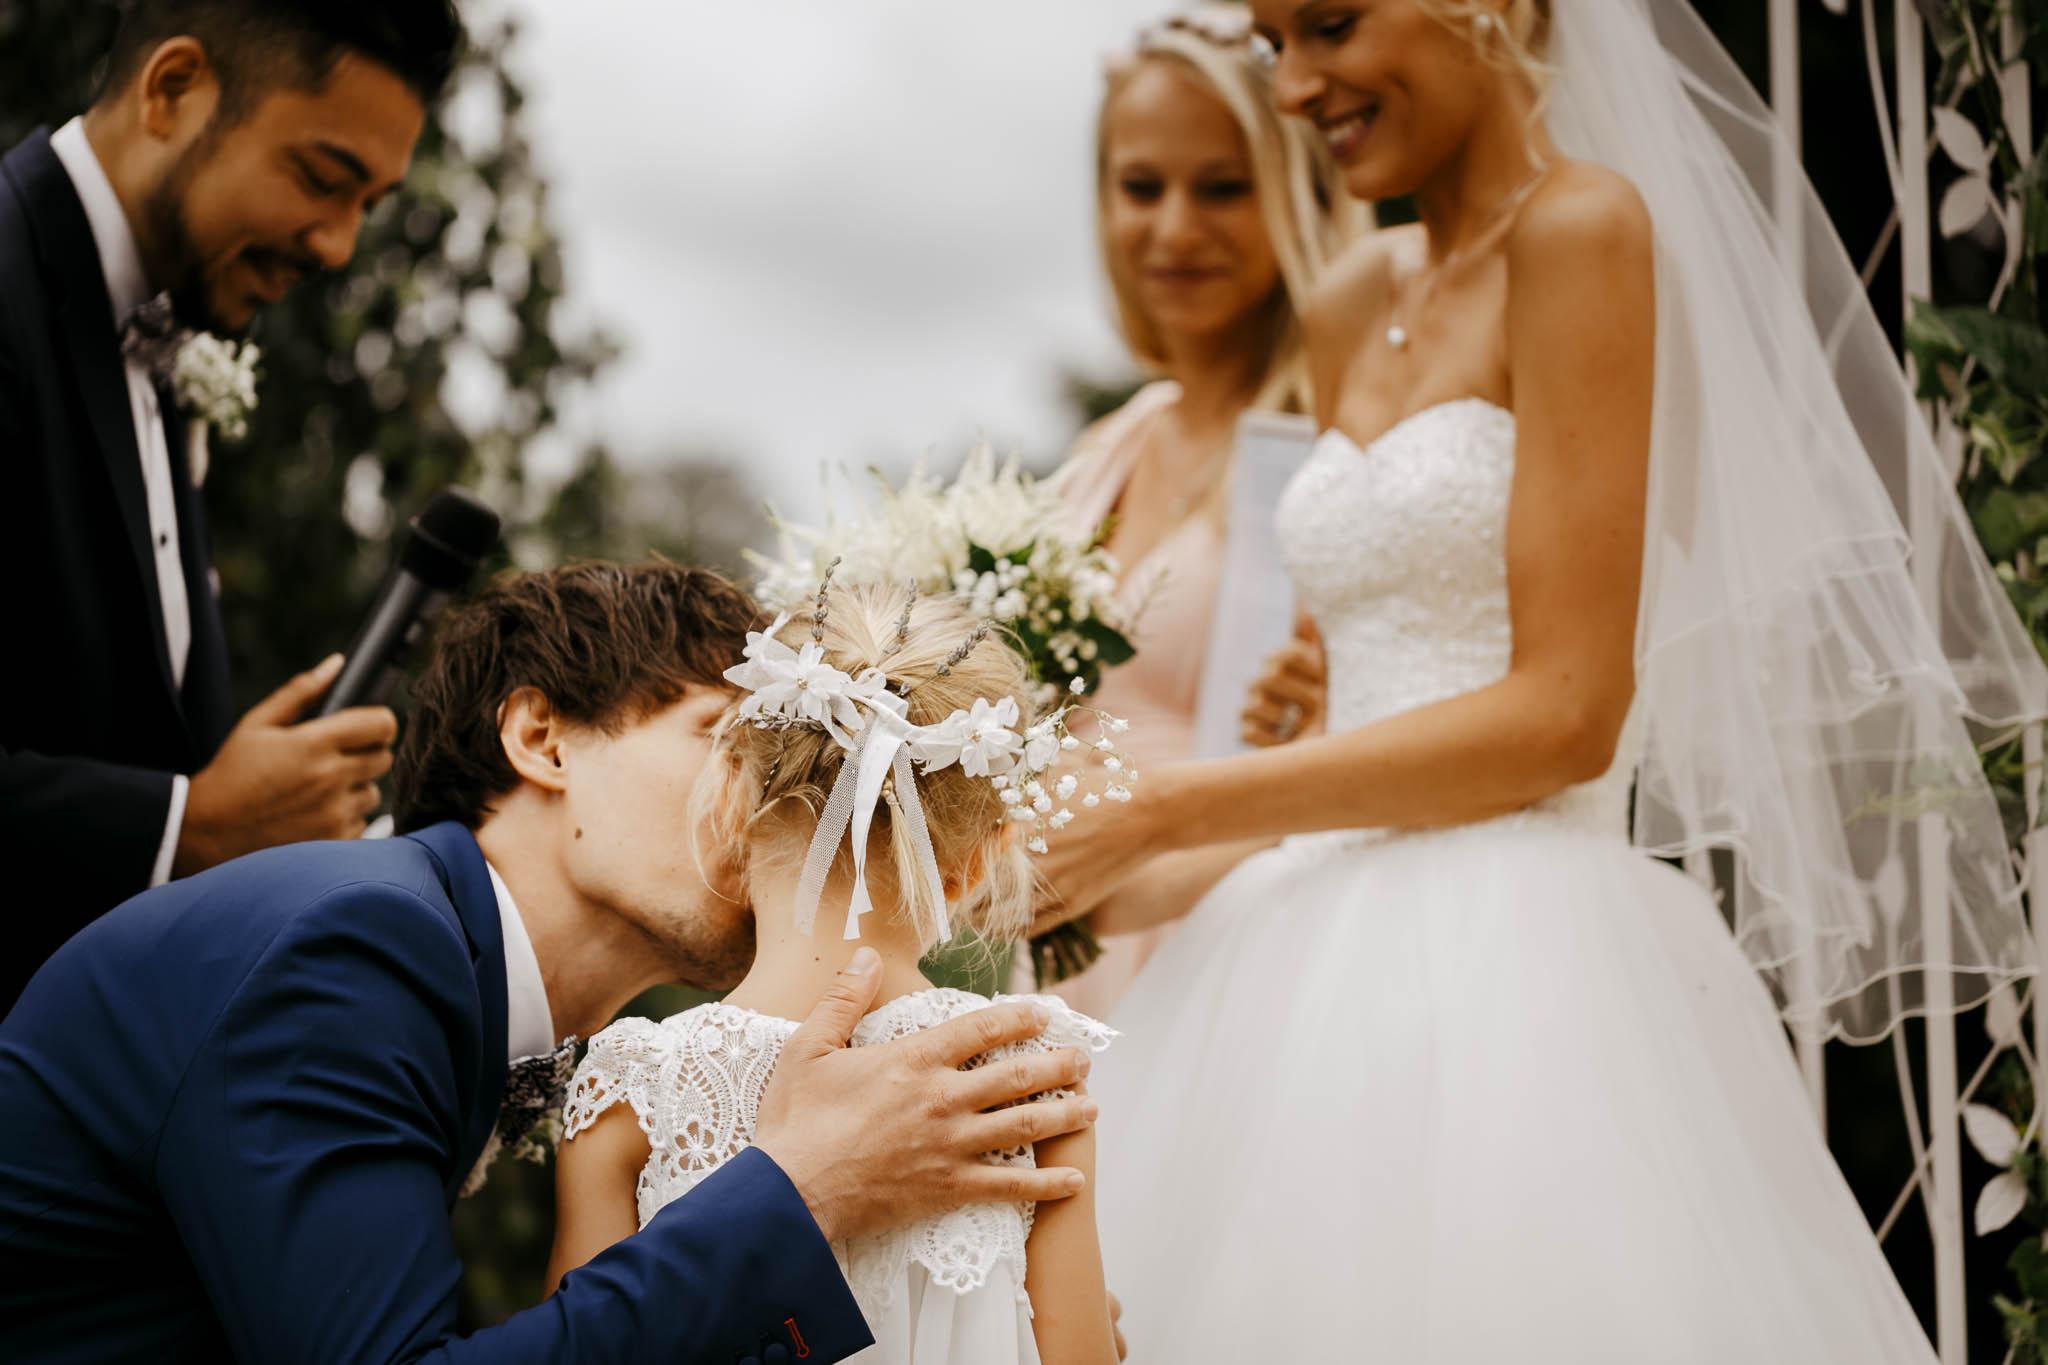 mariage-chateau-gaudras-ingold-48.jpg